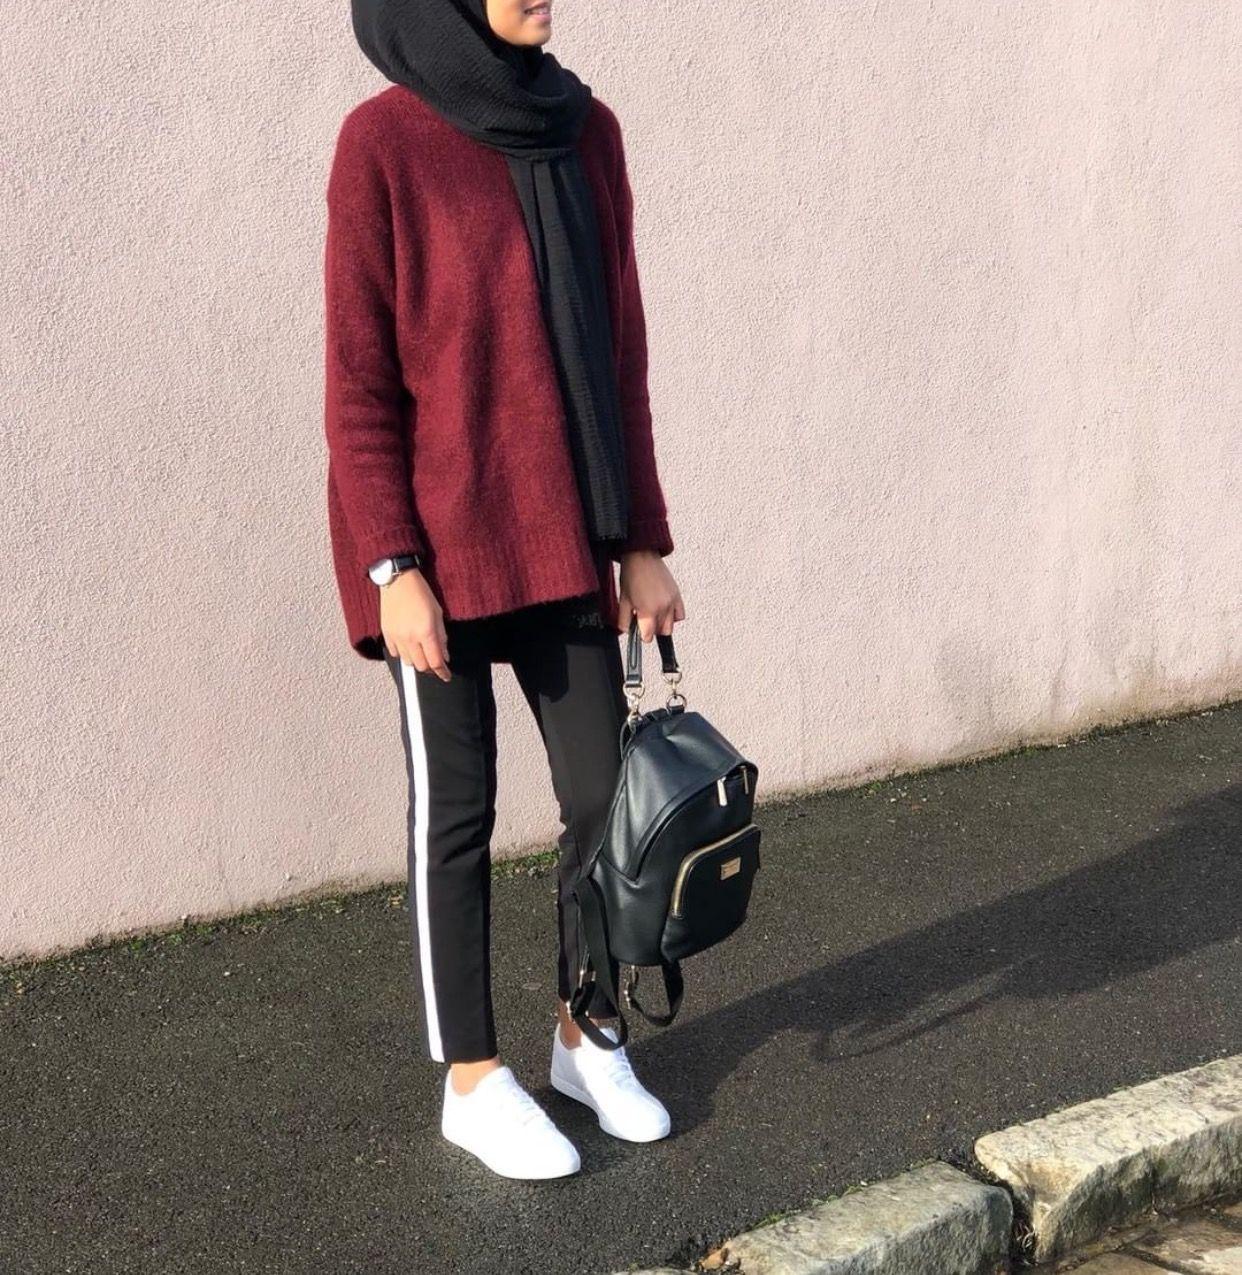 Pinterest Just4girls Pakaian Sporty Gaya Hijab Kasual